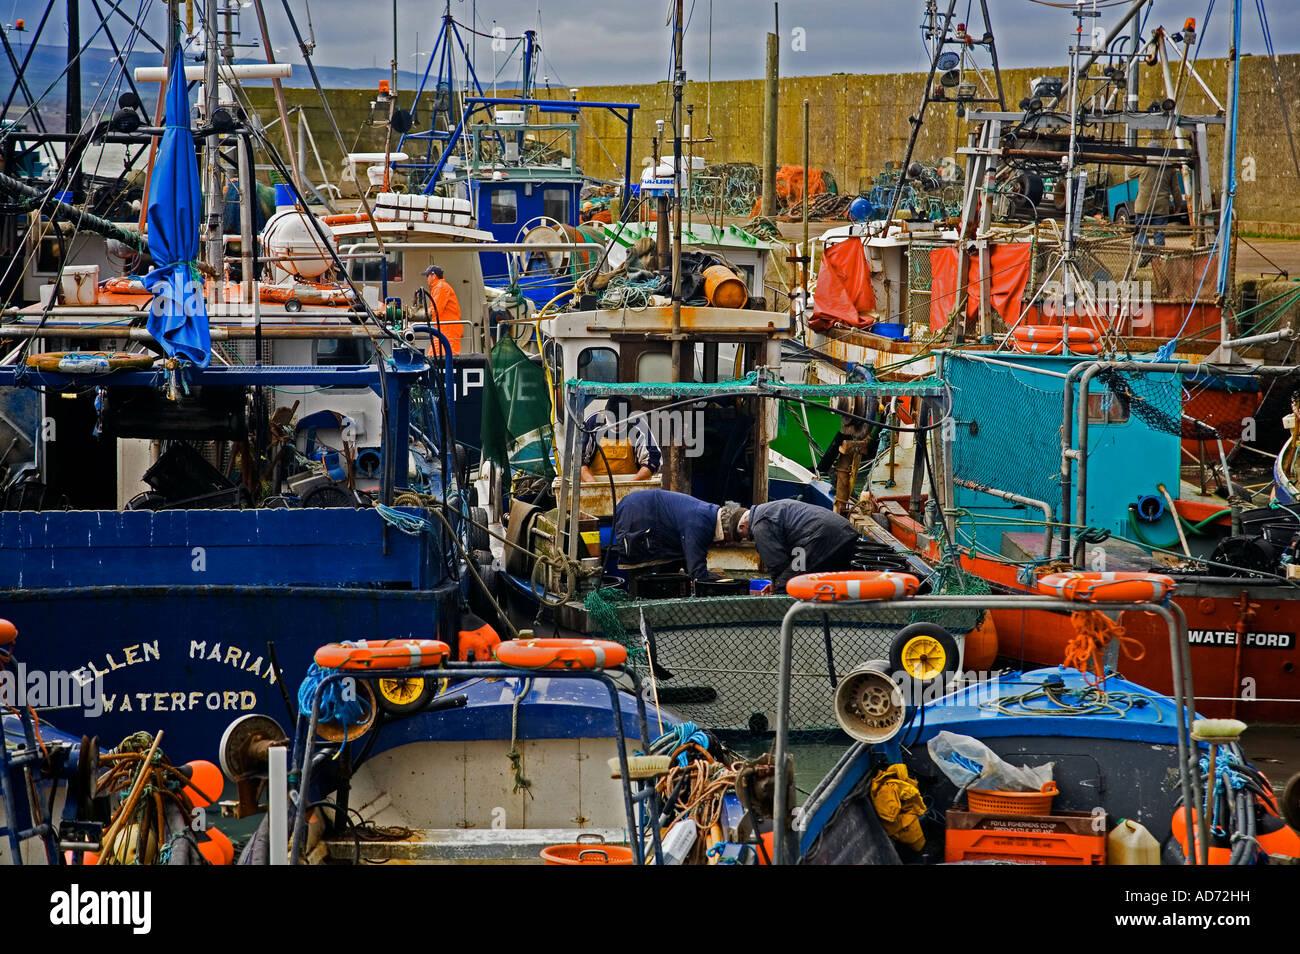 Helvick Fishing Harbour, Ring Gaeltacht (Gaelic Speaking Area) County Waterford, Ireland - Stock Image